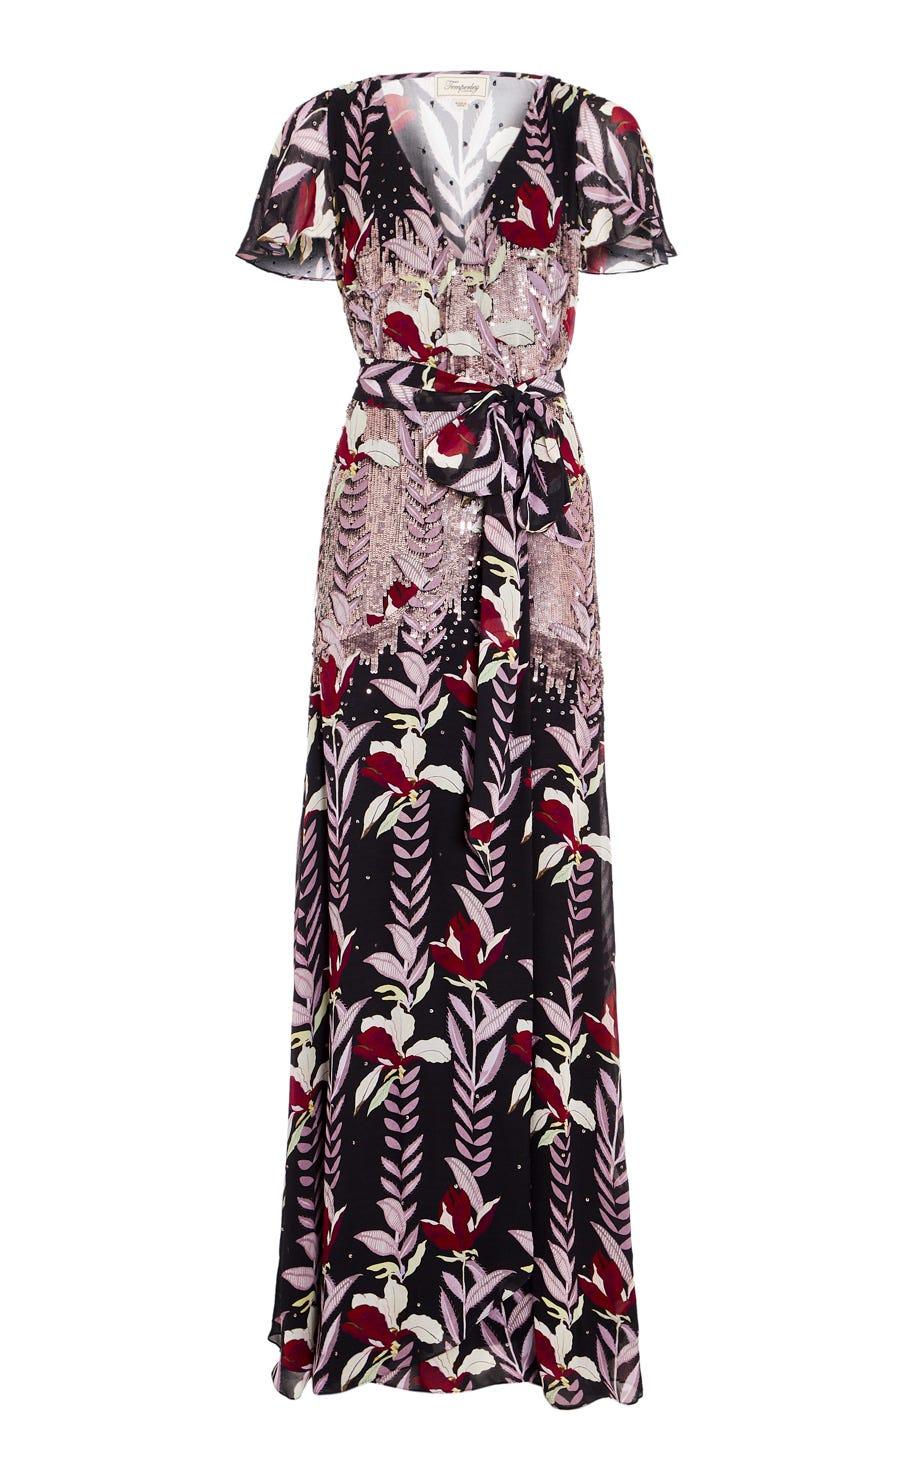 Bellflower Wrap Dress